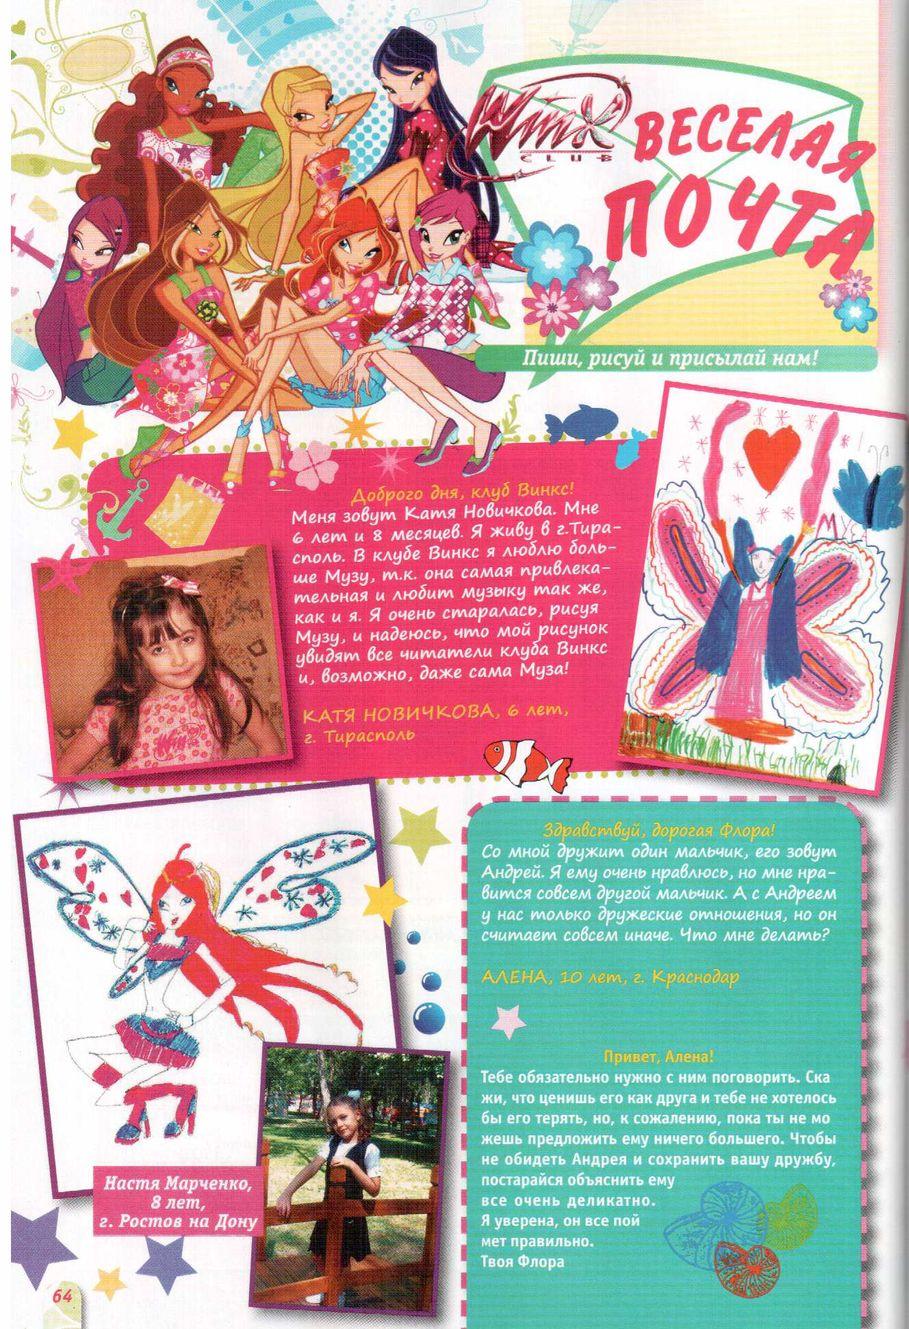 Комикс Винкс Winx - Любовь и ревность (Журнал Винкс №7 2011) - стр. 64